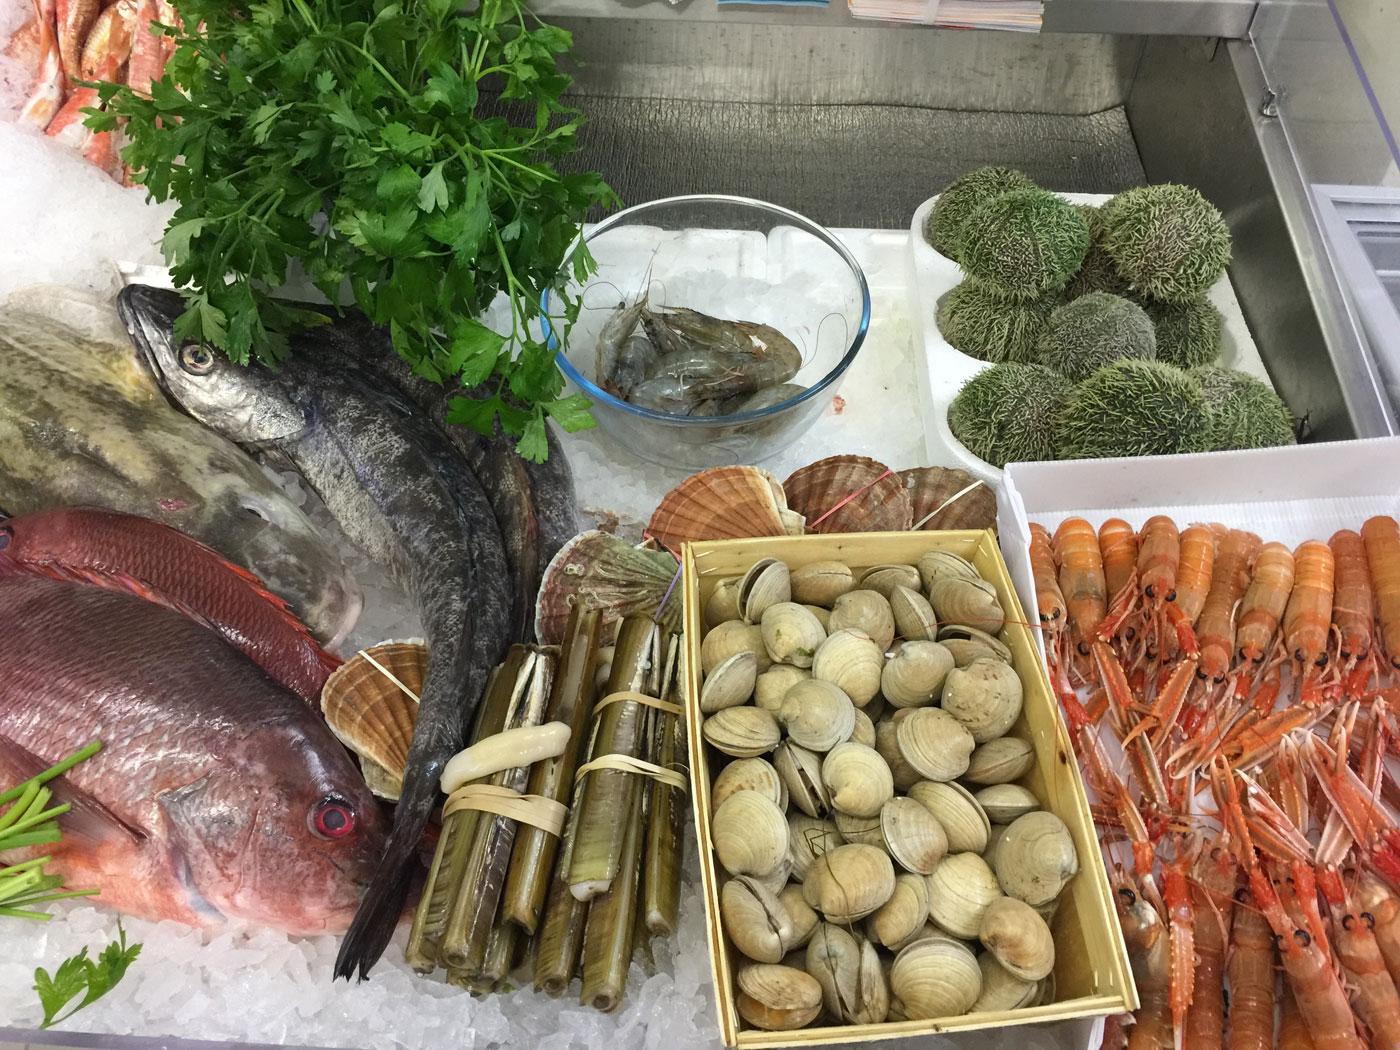 Eddie's Seafood Market & Fishmongers, Marchmont, Edinburgh Scotland UK |